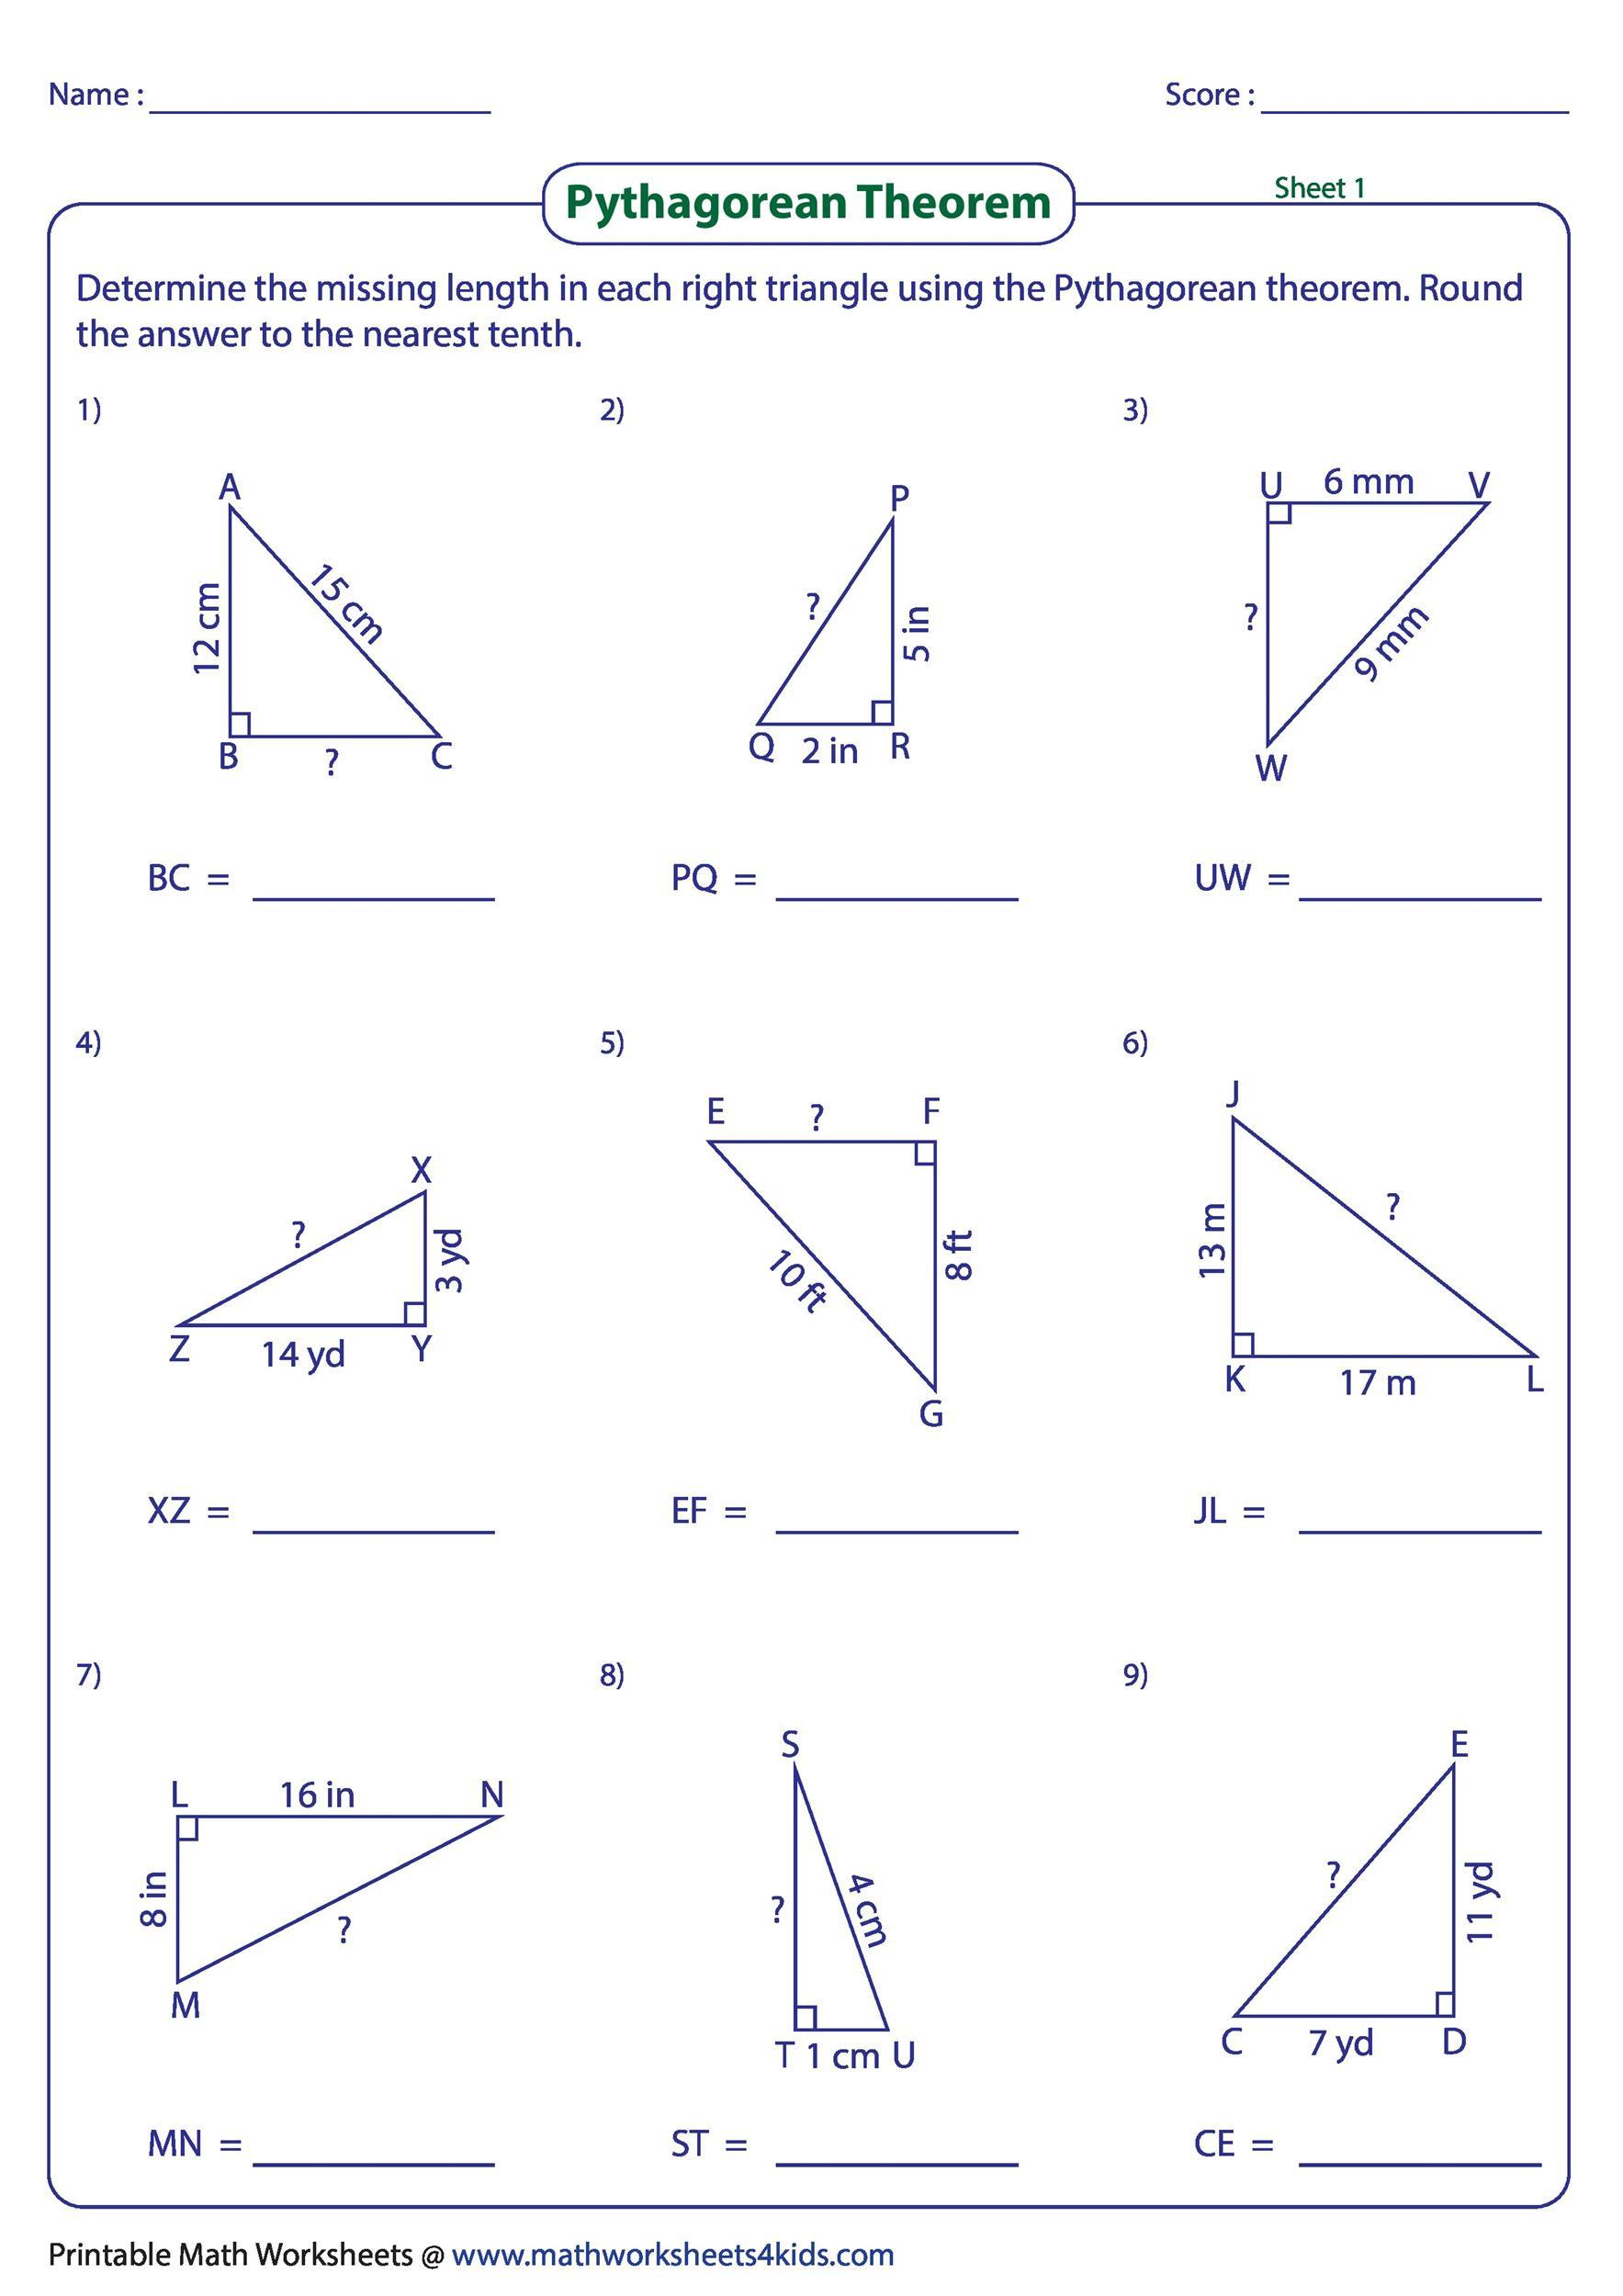 pythagorean theorem 06